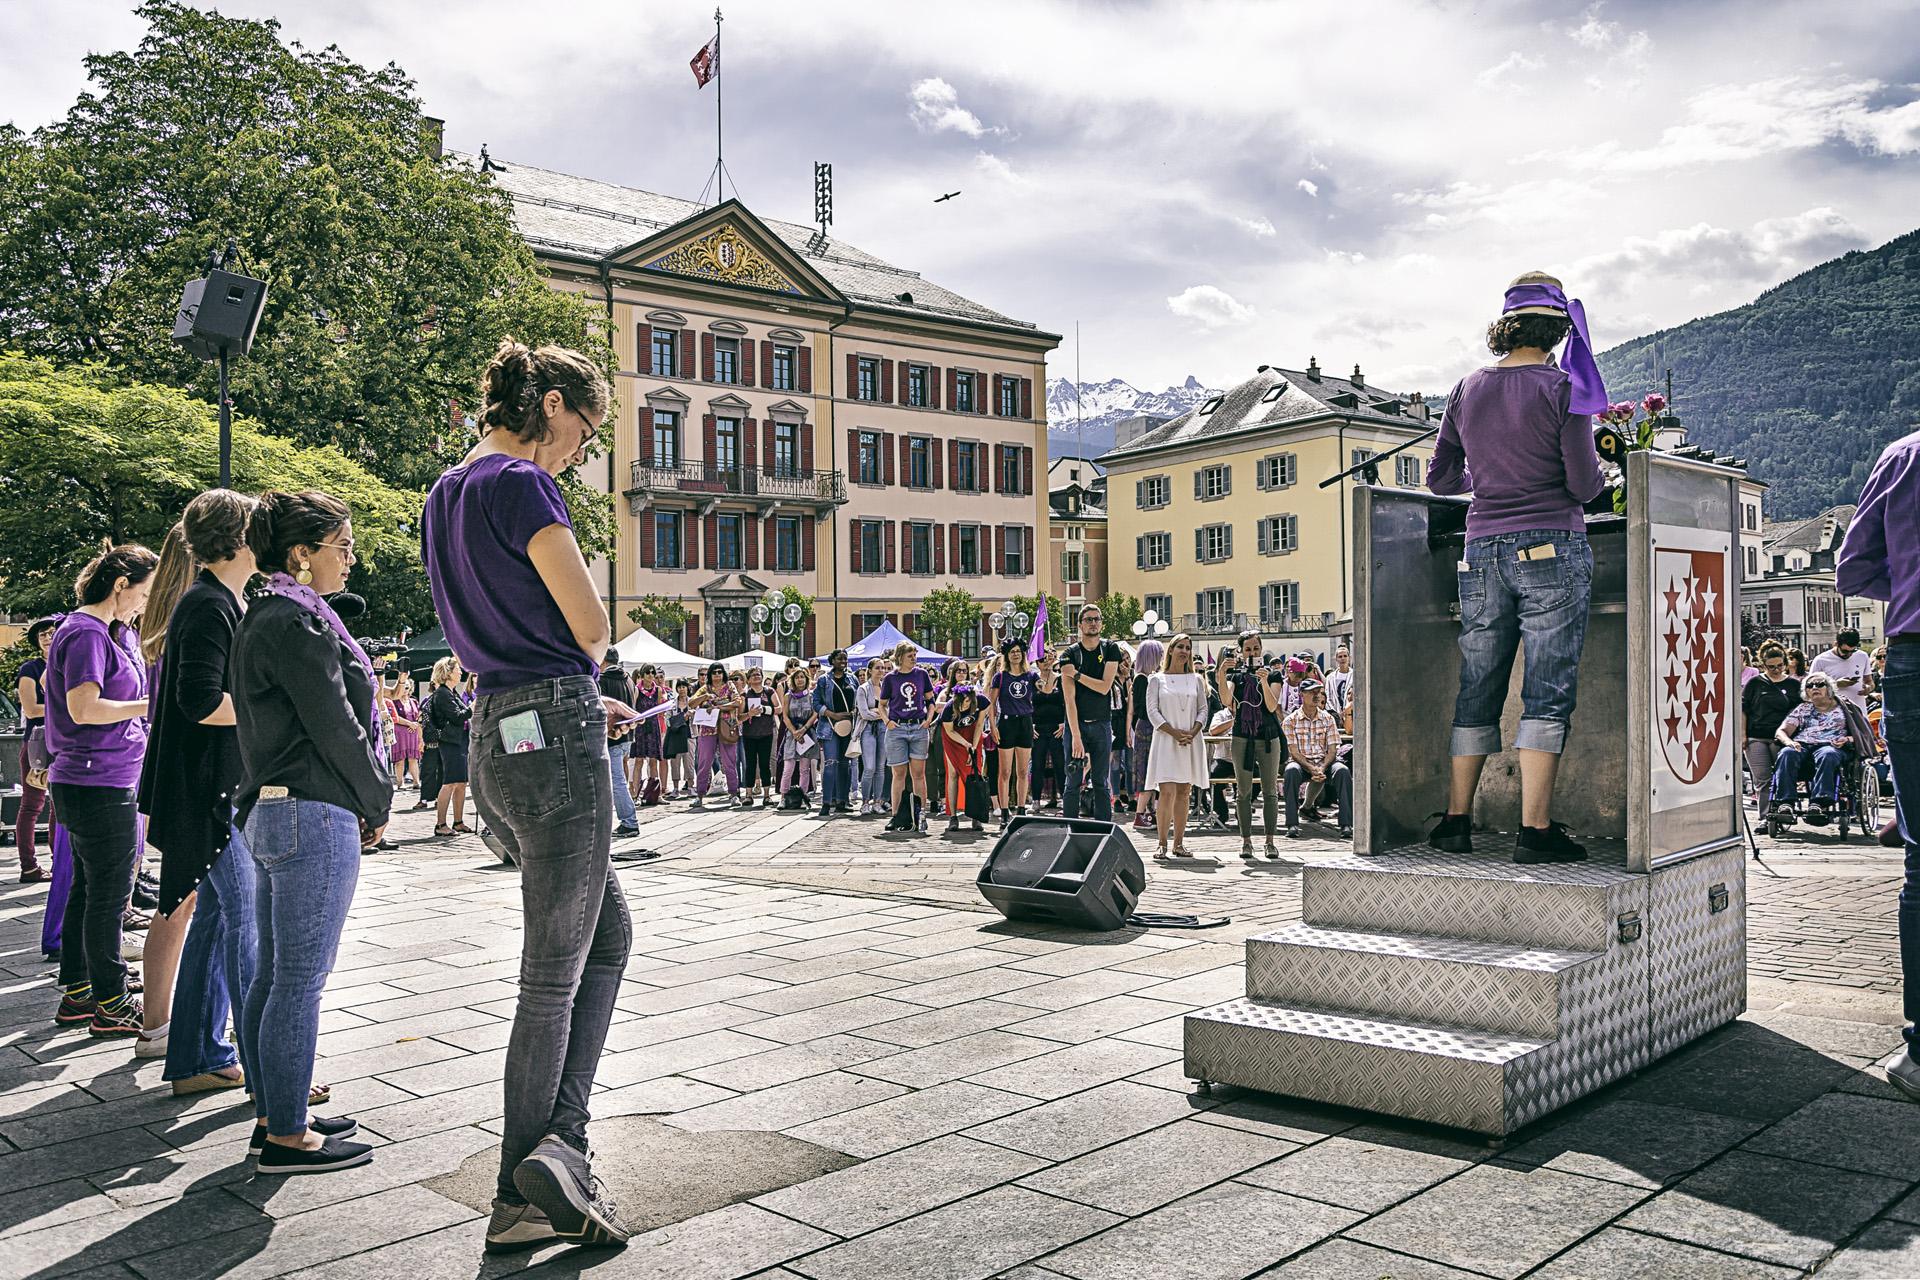 Grève des femmes, Sion 2019